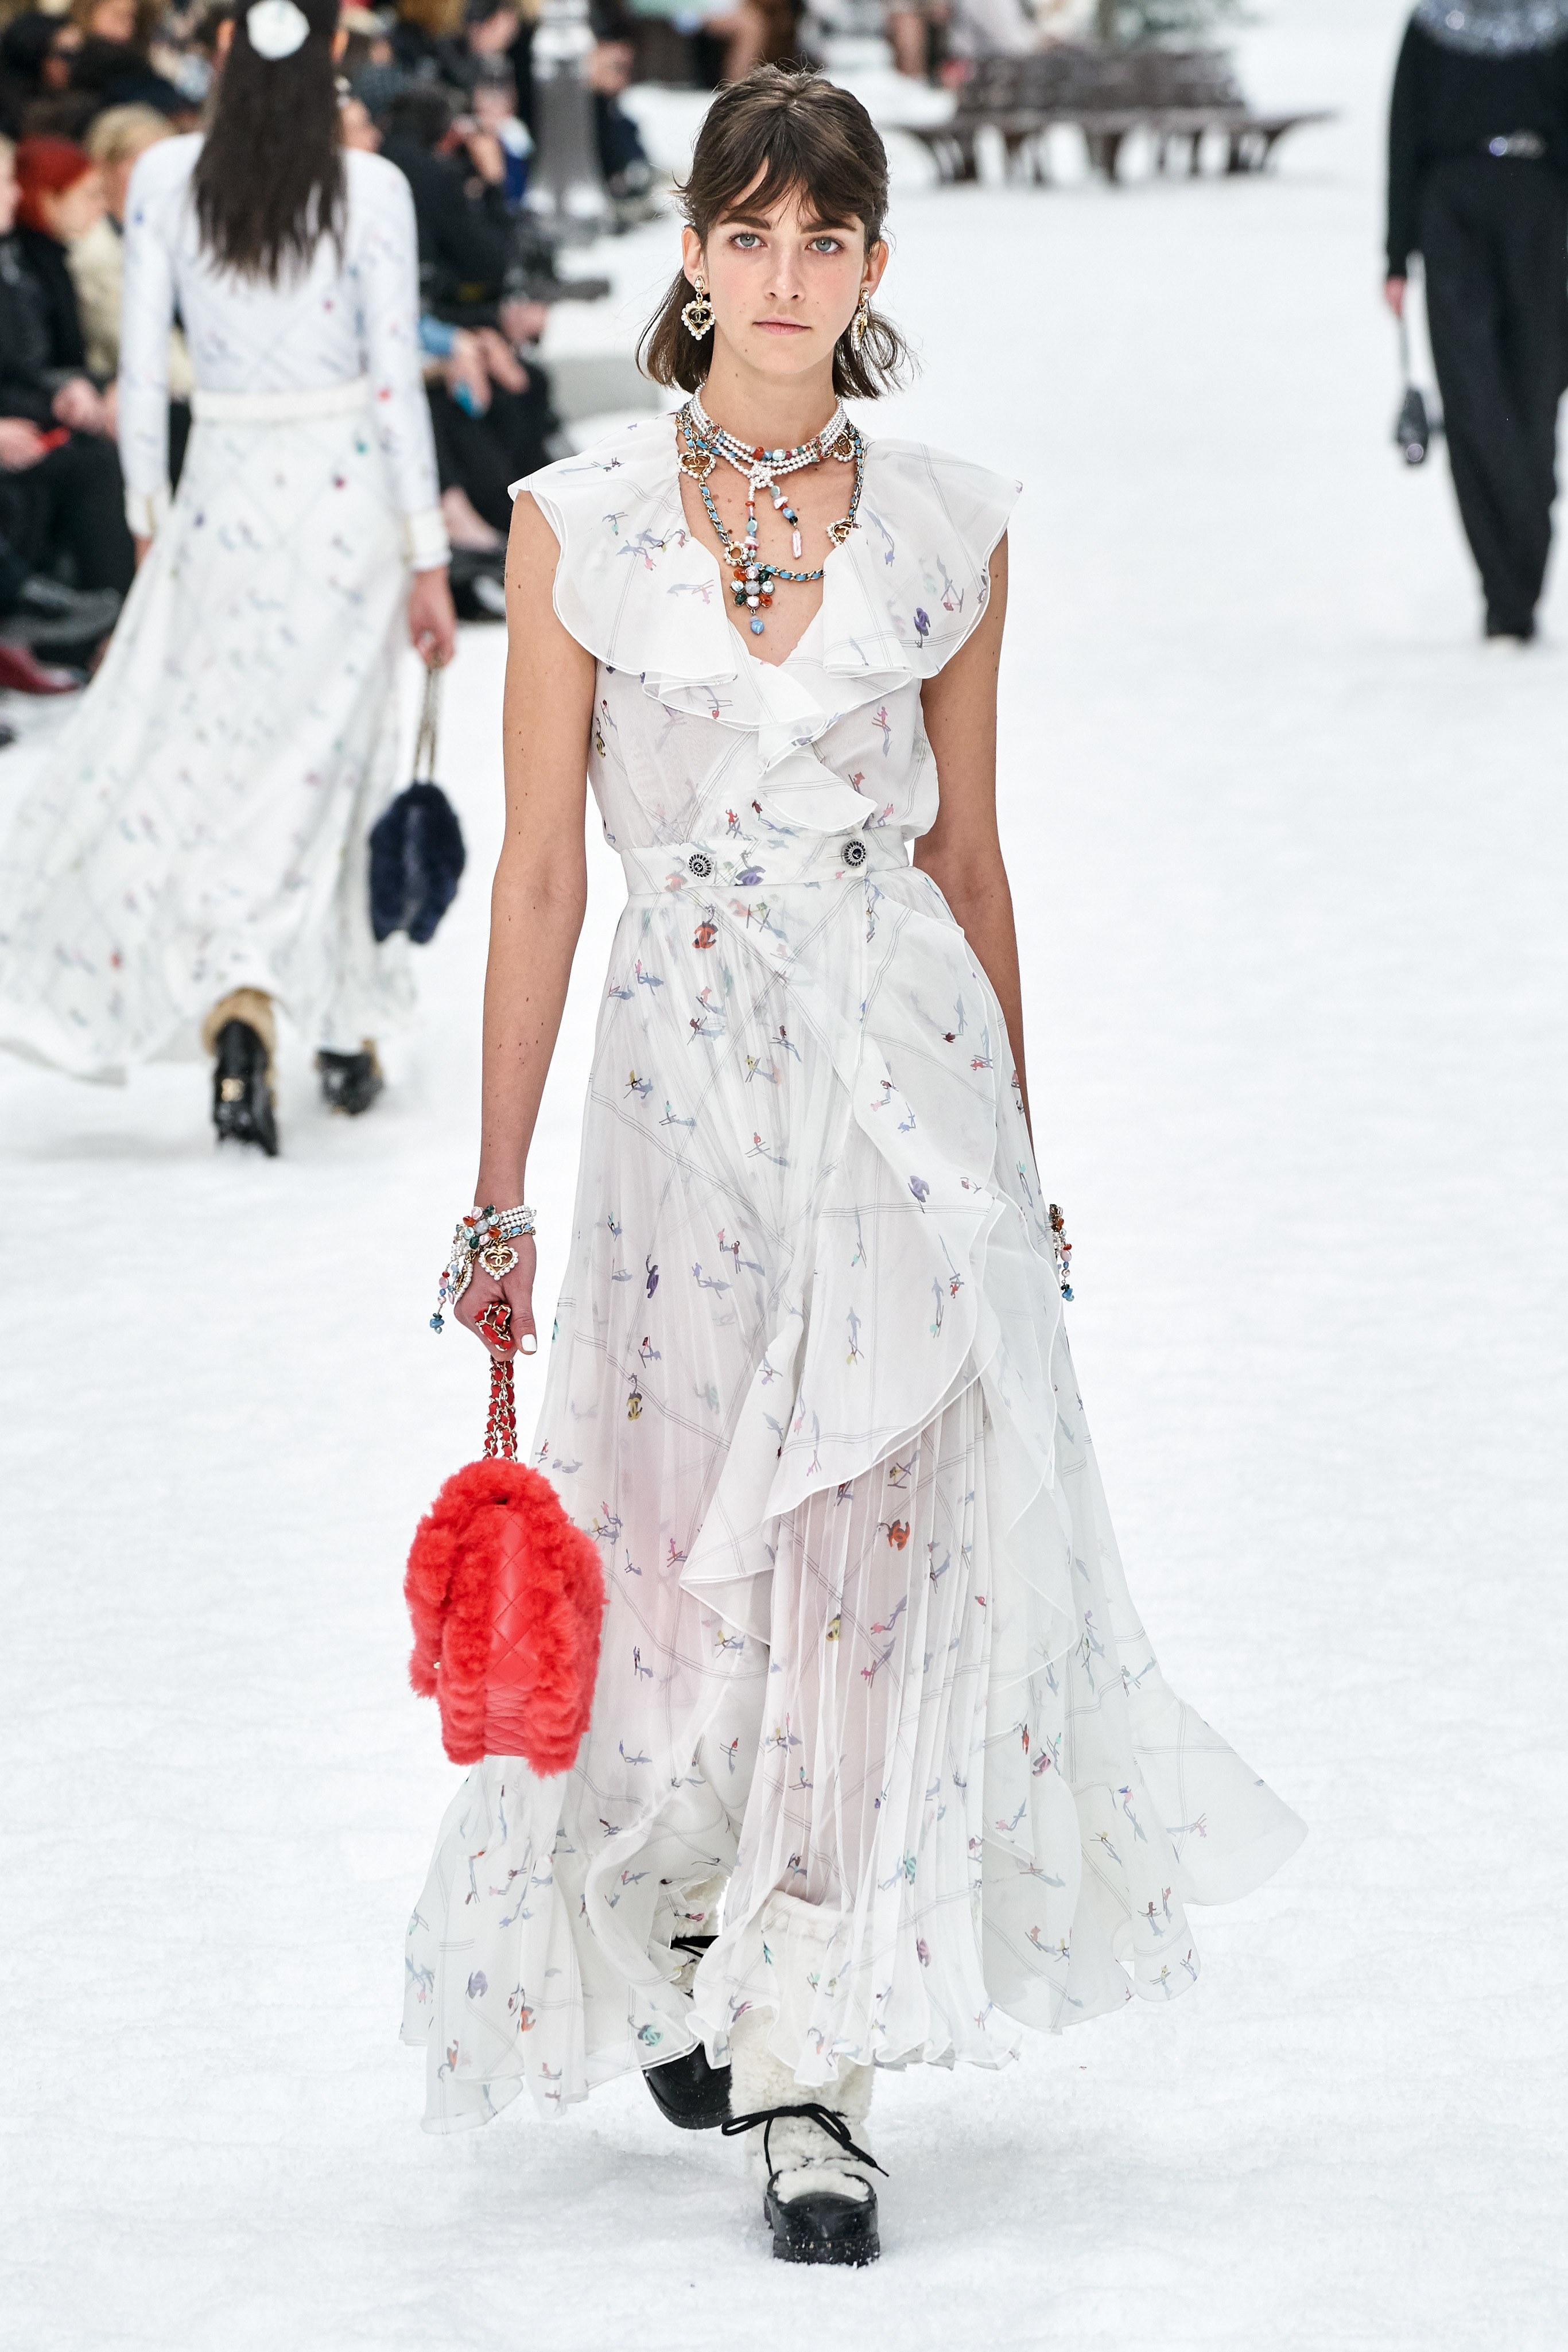 Cris Herrmann desfila para Chanel / Cortesia